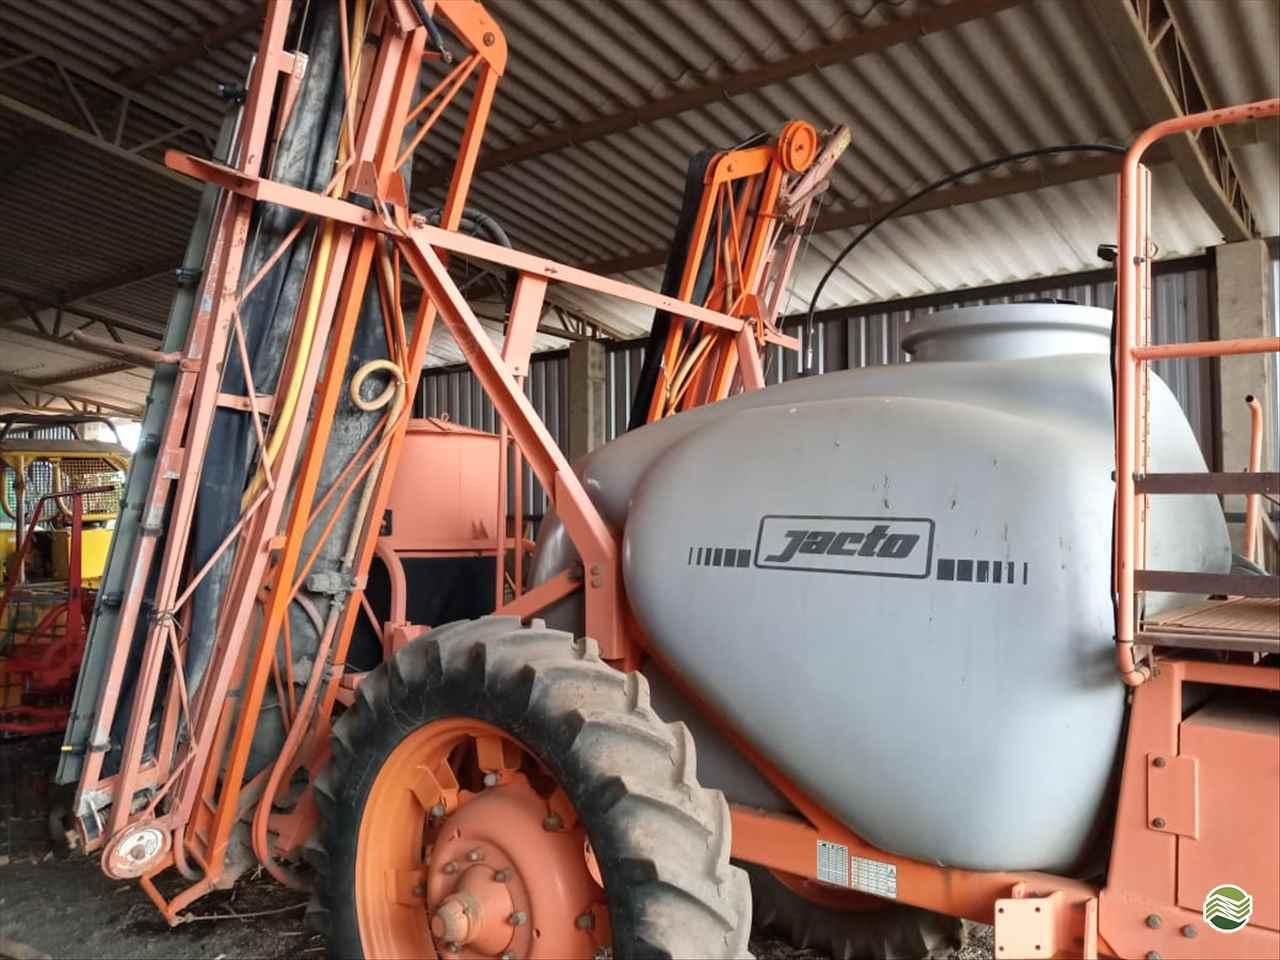 ADVANCE BK3024 VORTEX de Dalzotto Equipamentos Agrícolas - PRUDENTOPOLIS/PR